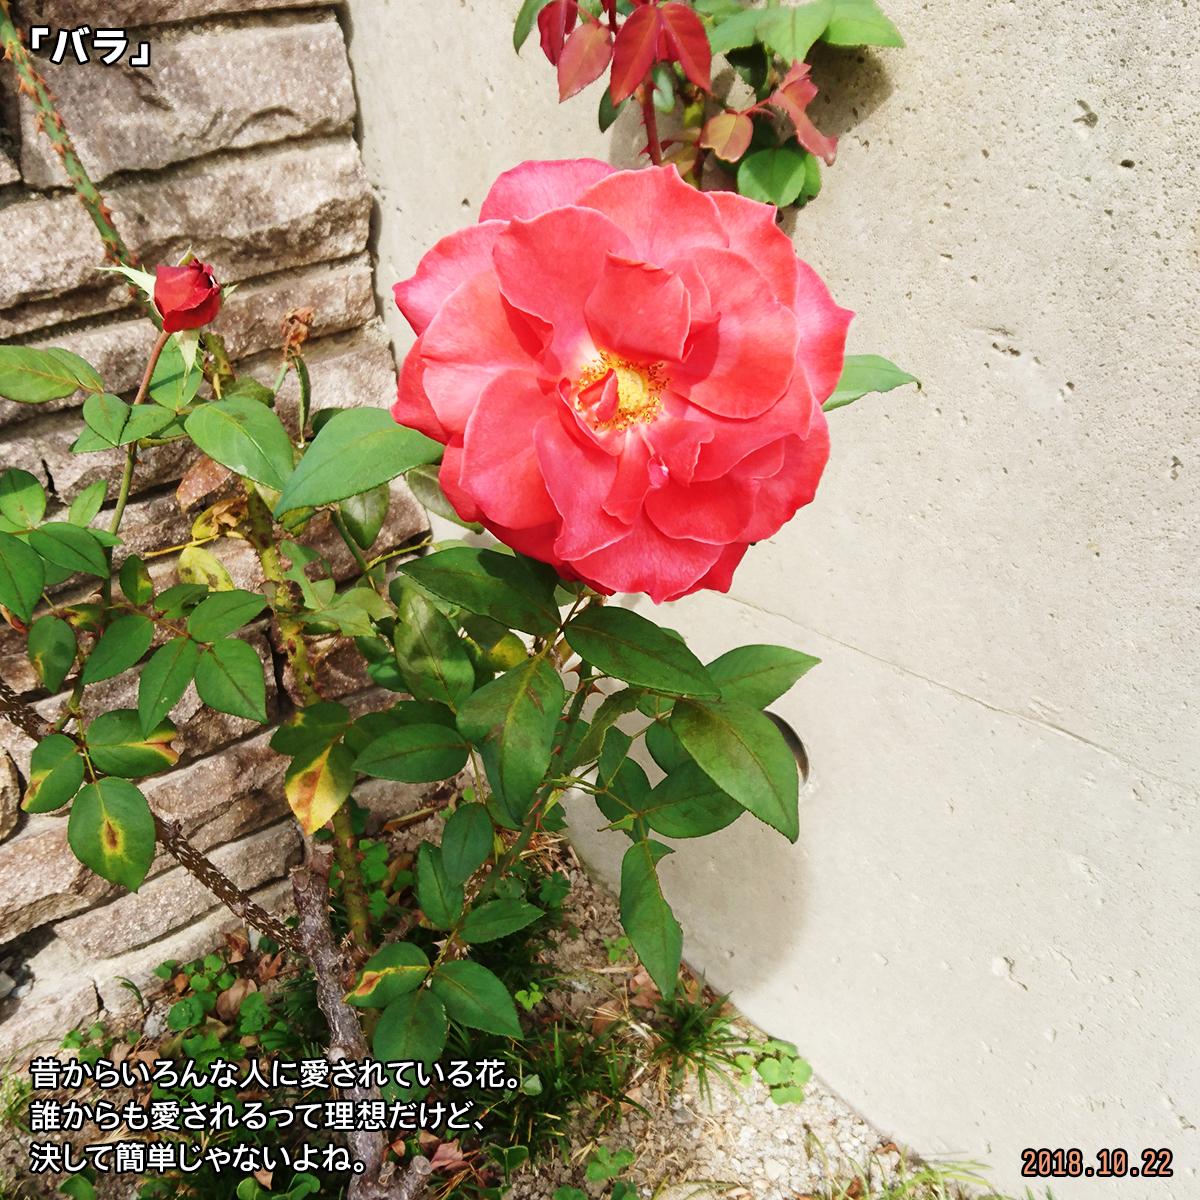 DSC_8493_20181130174831701.jpg